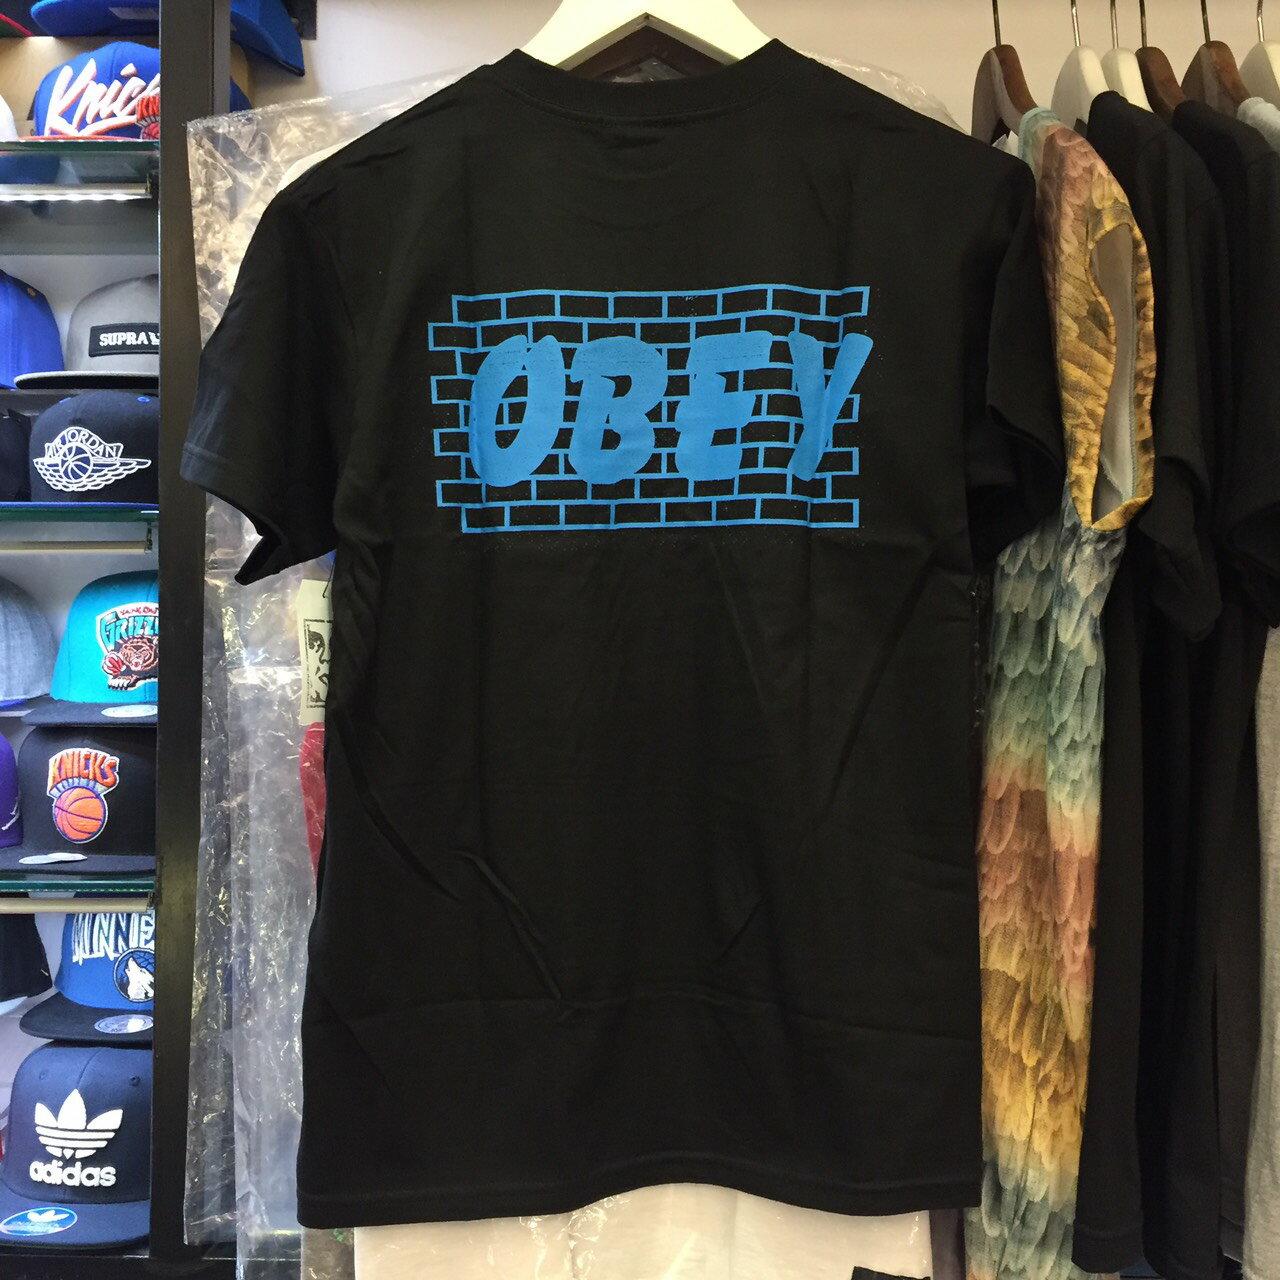 BEETLE PLUS 西門町經銷 全新 美國品牌 OBEY BRICK WALL TEE 磚牆 全黑 白字 黑白 LOGO 短T 163081179BLK OB-418 2